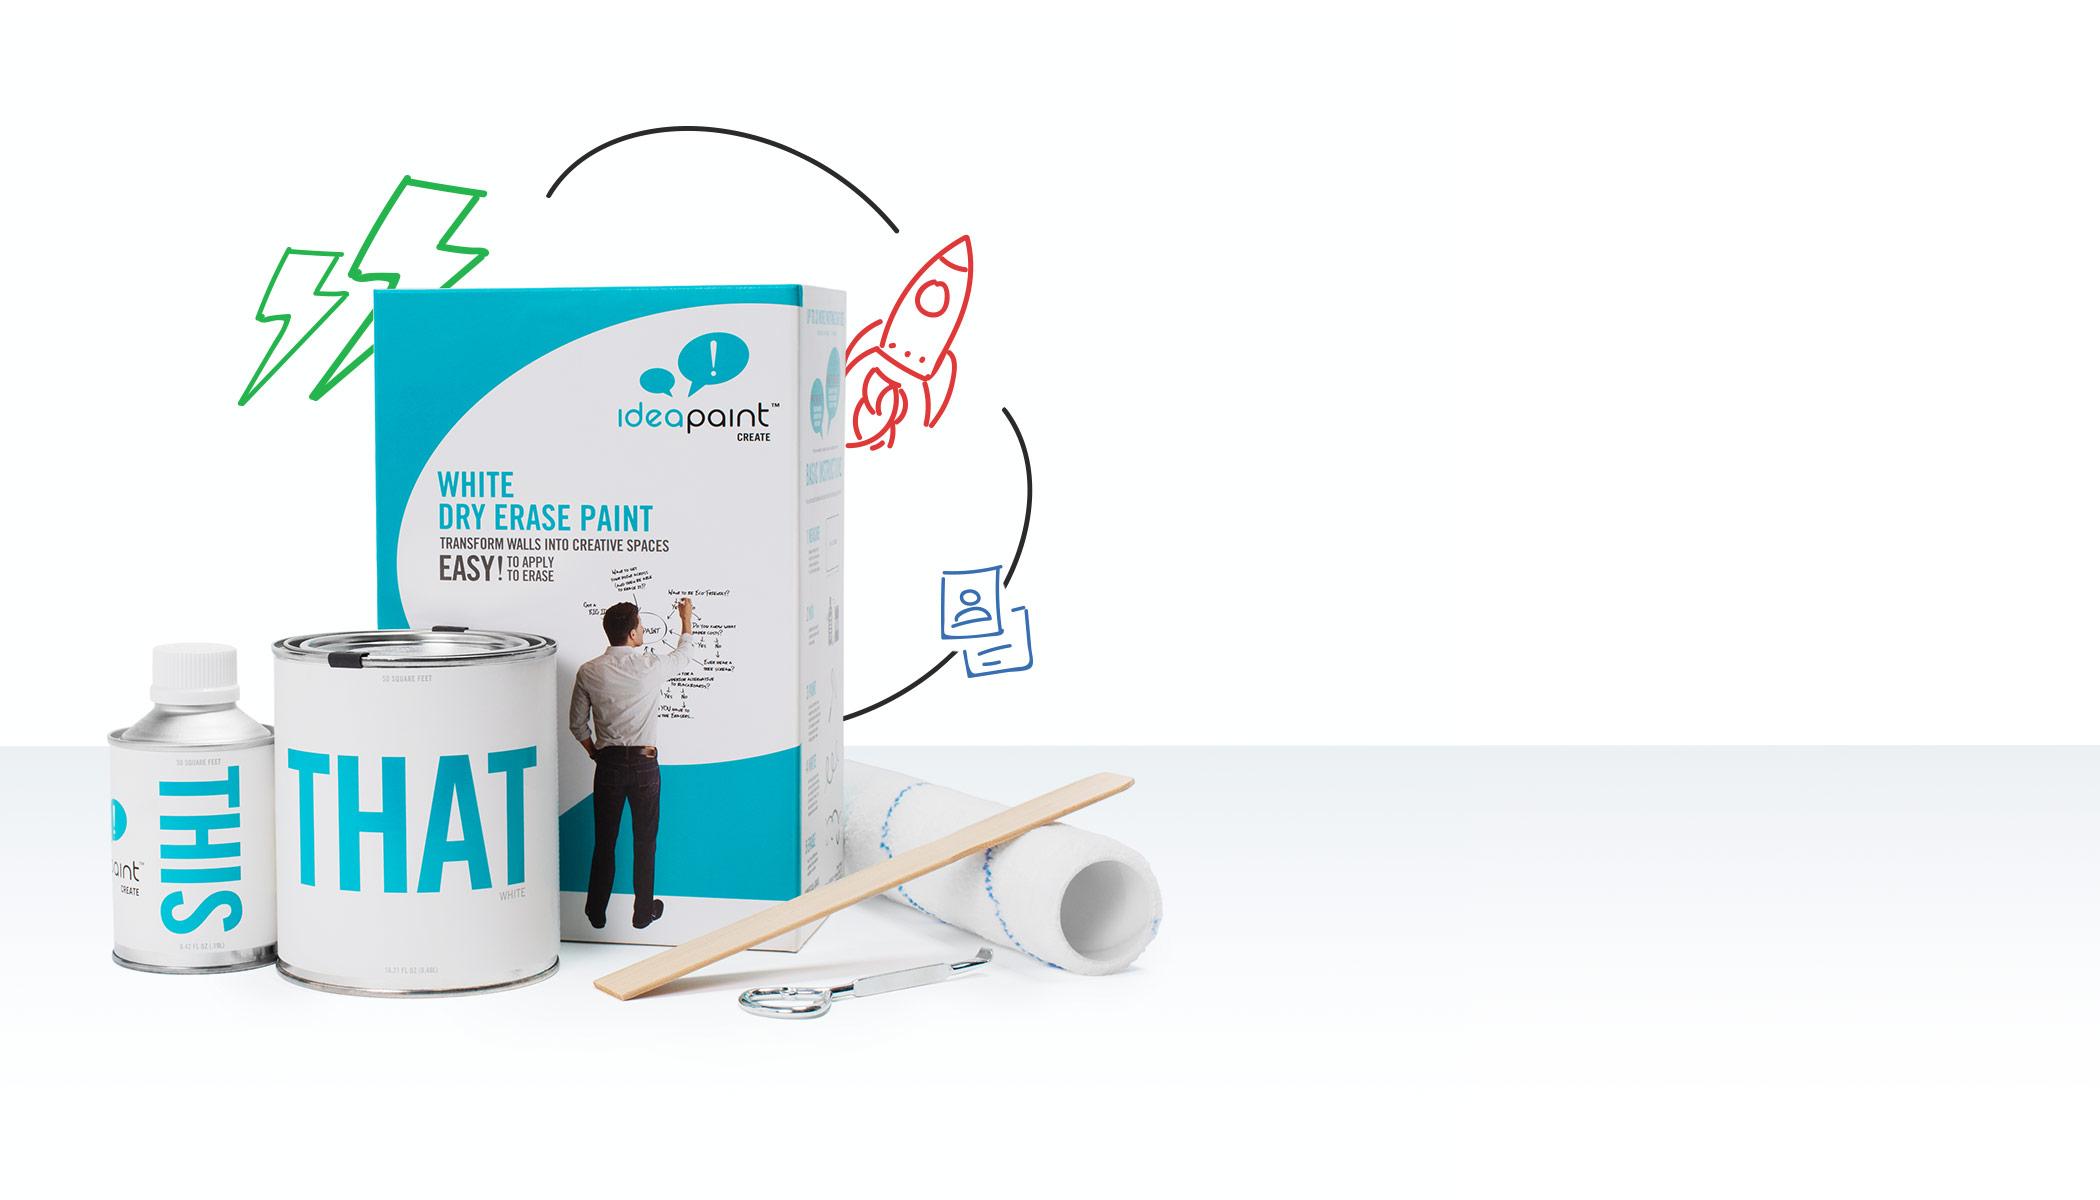 Create WHITE - dry-erase paint - CREATE White Sample - CREATE White 50 sq ft - CREATE White 100 sq ft - CREATE White 200 sq ft